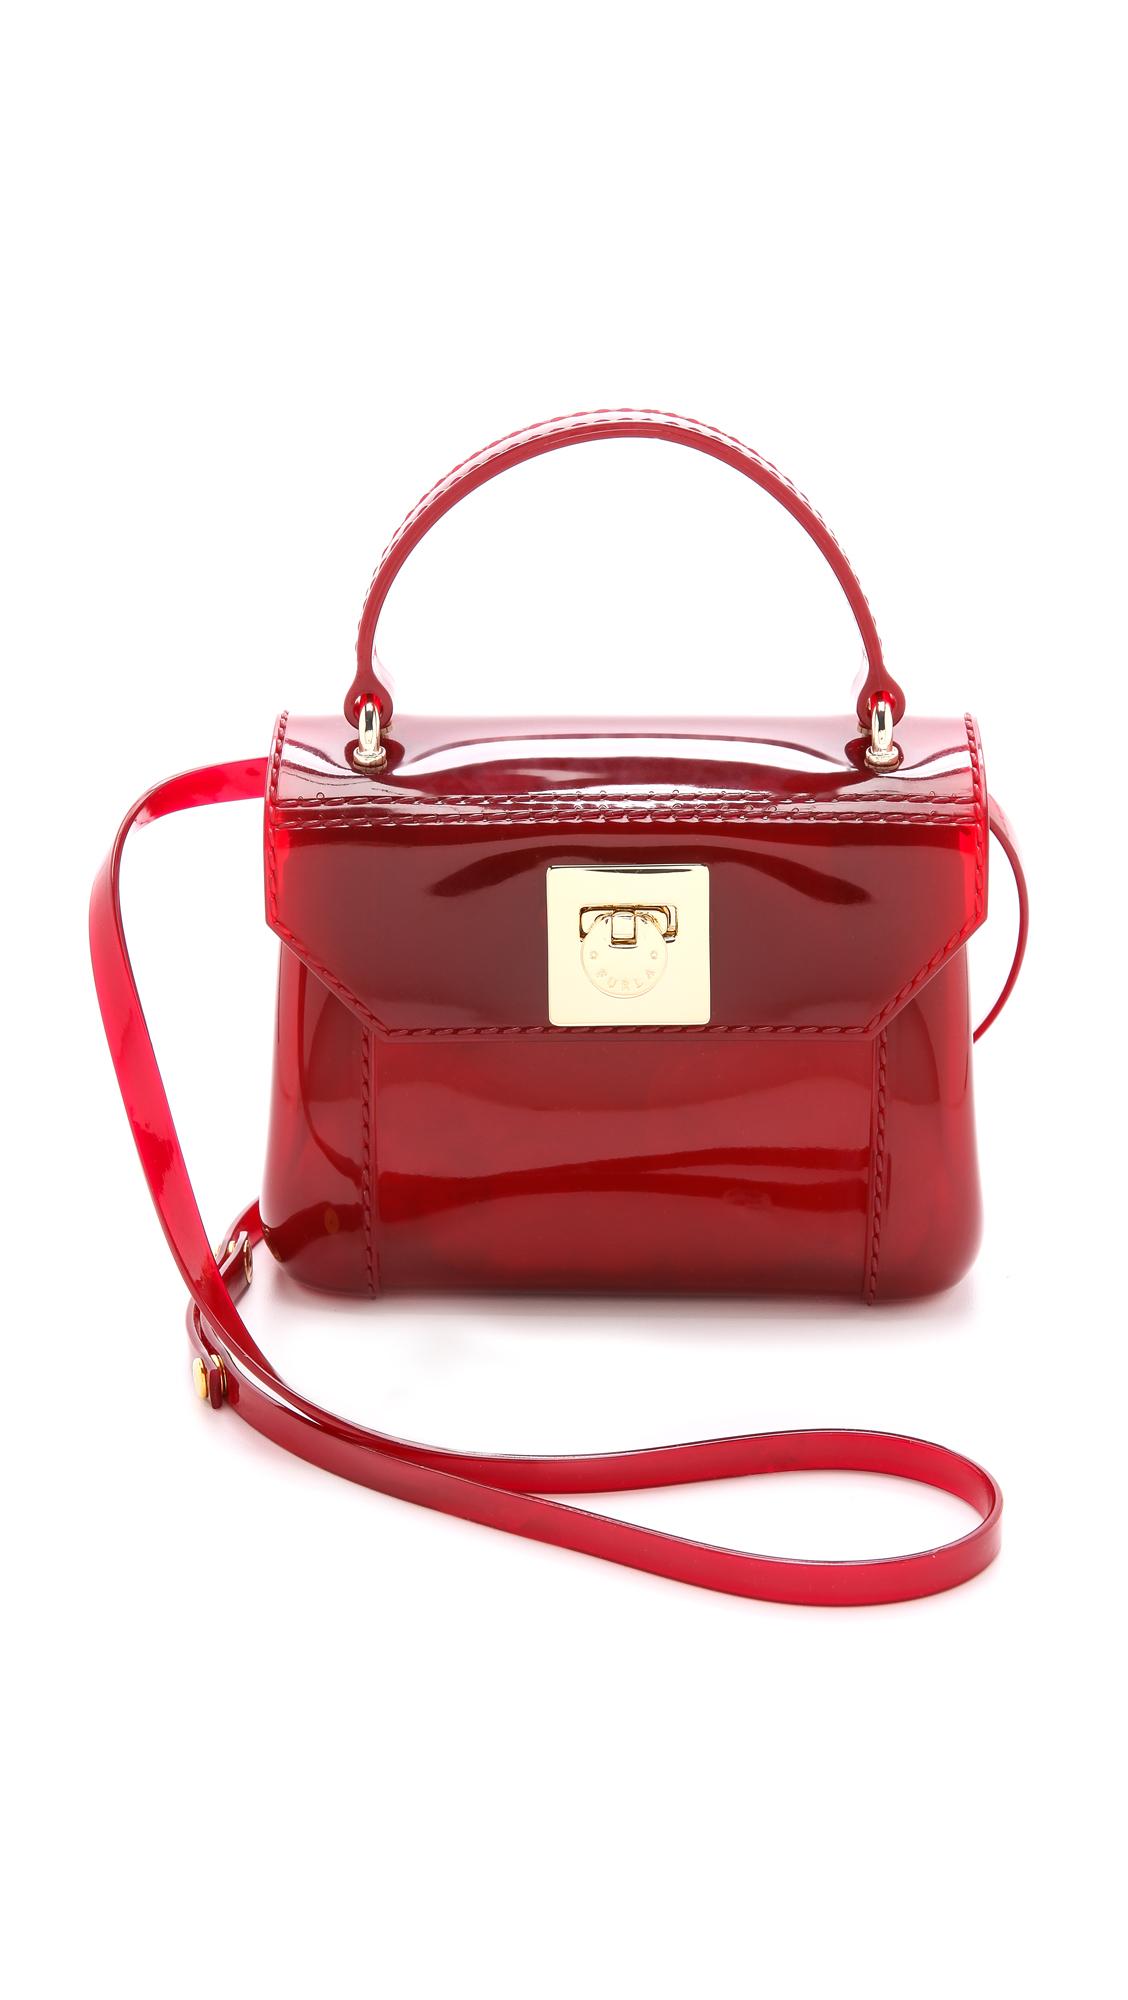 42489c0bc4 Mini Candy Cross Body Furla Bag HqOPC5w